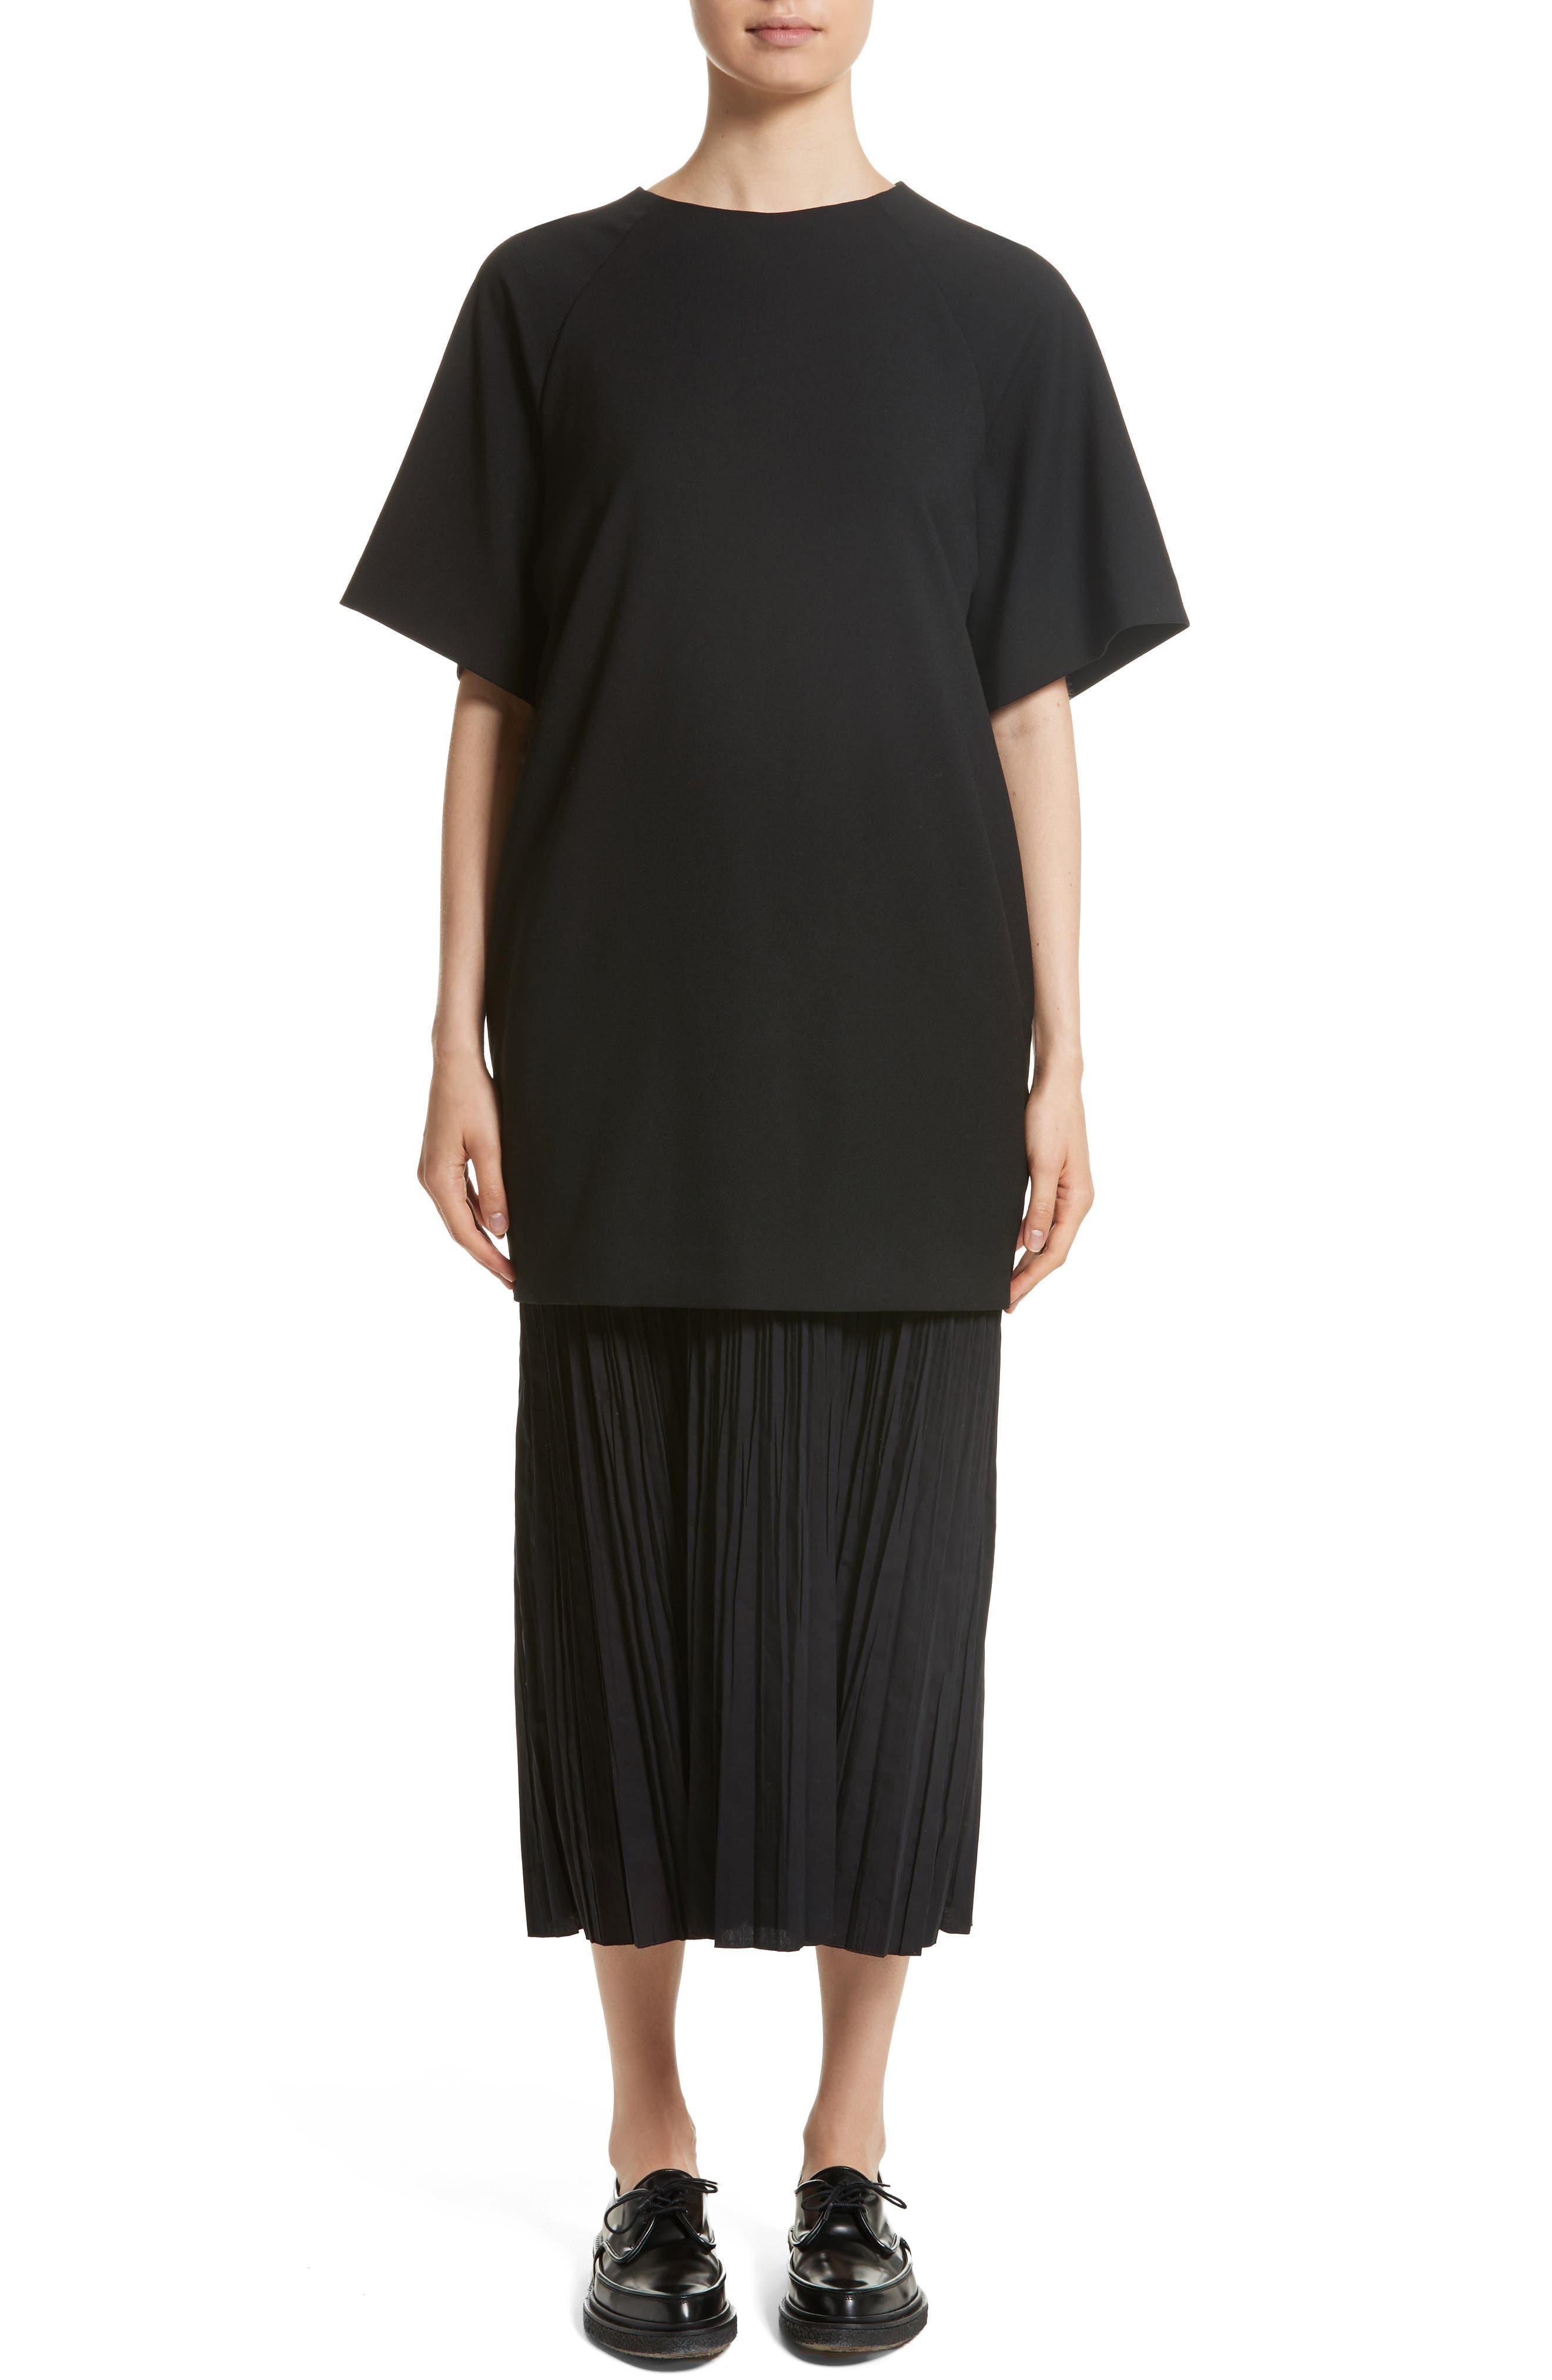 Y's by Yohji Yamamoto K Bottom Pleated Dress